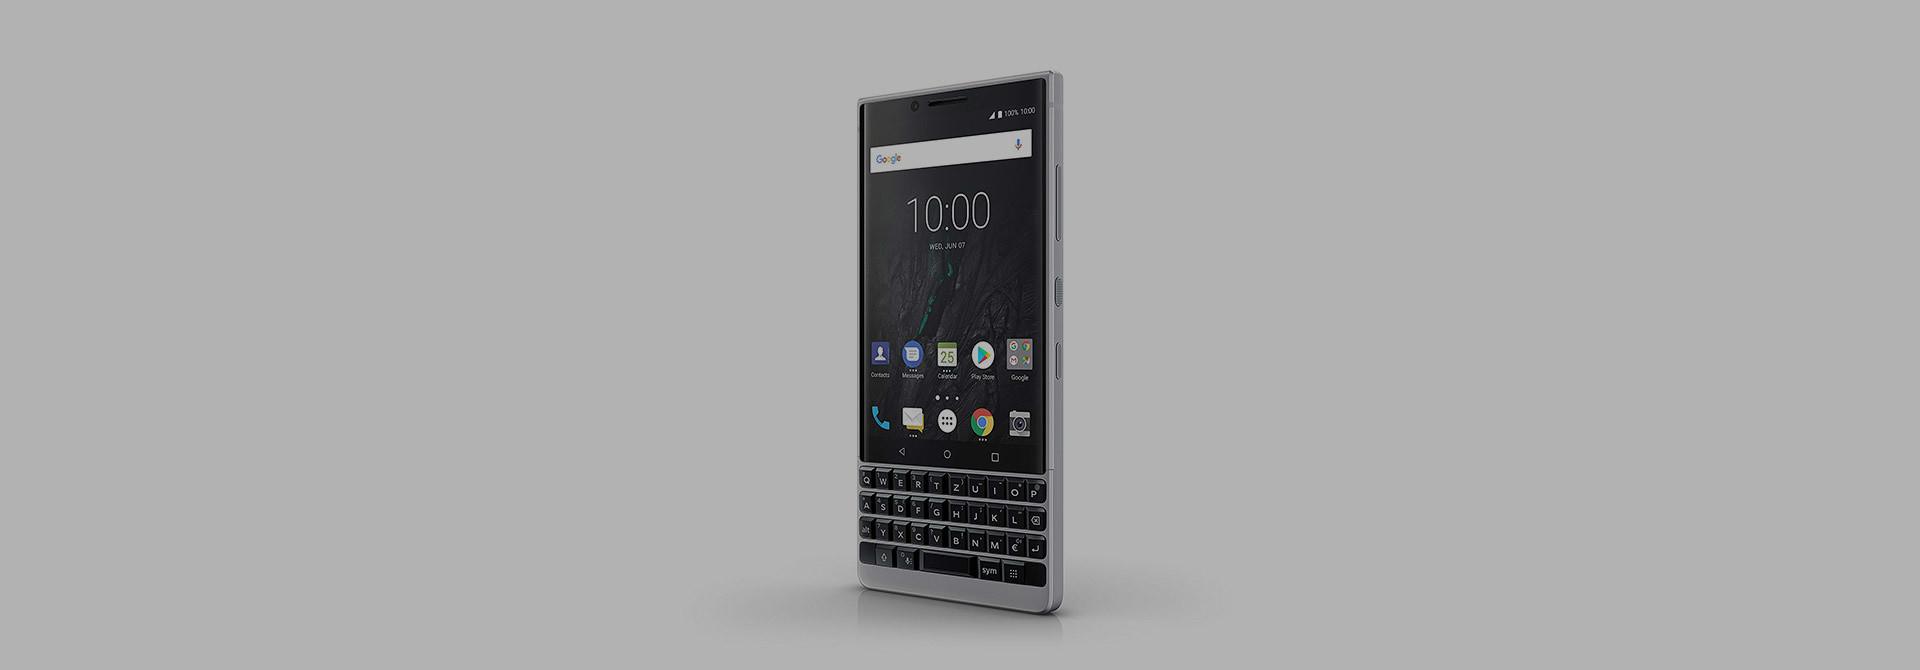 BlackBerry Smartphone Sleeve